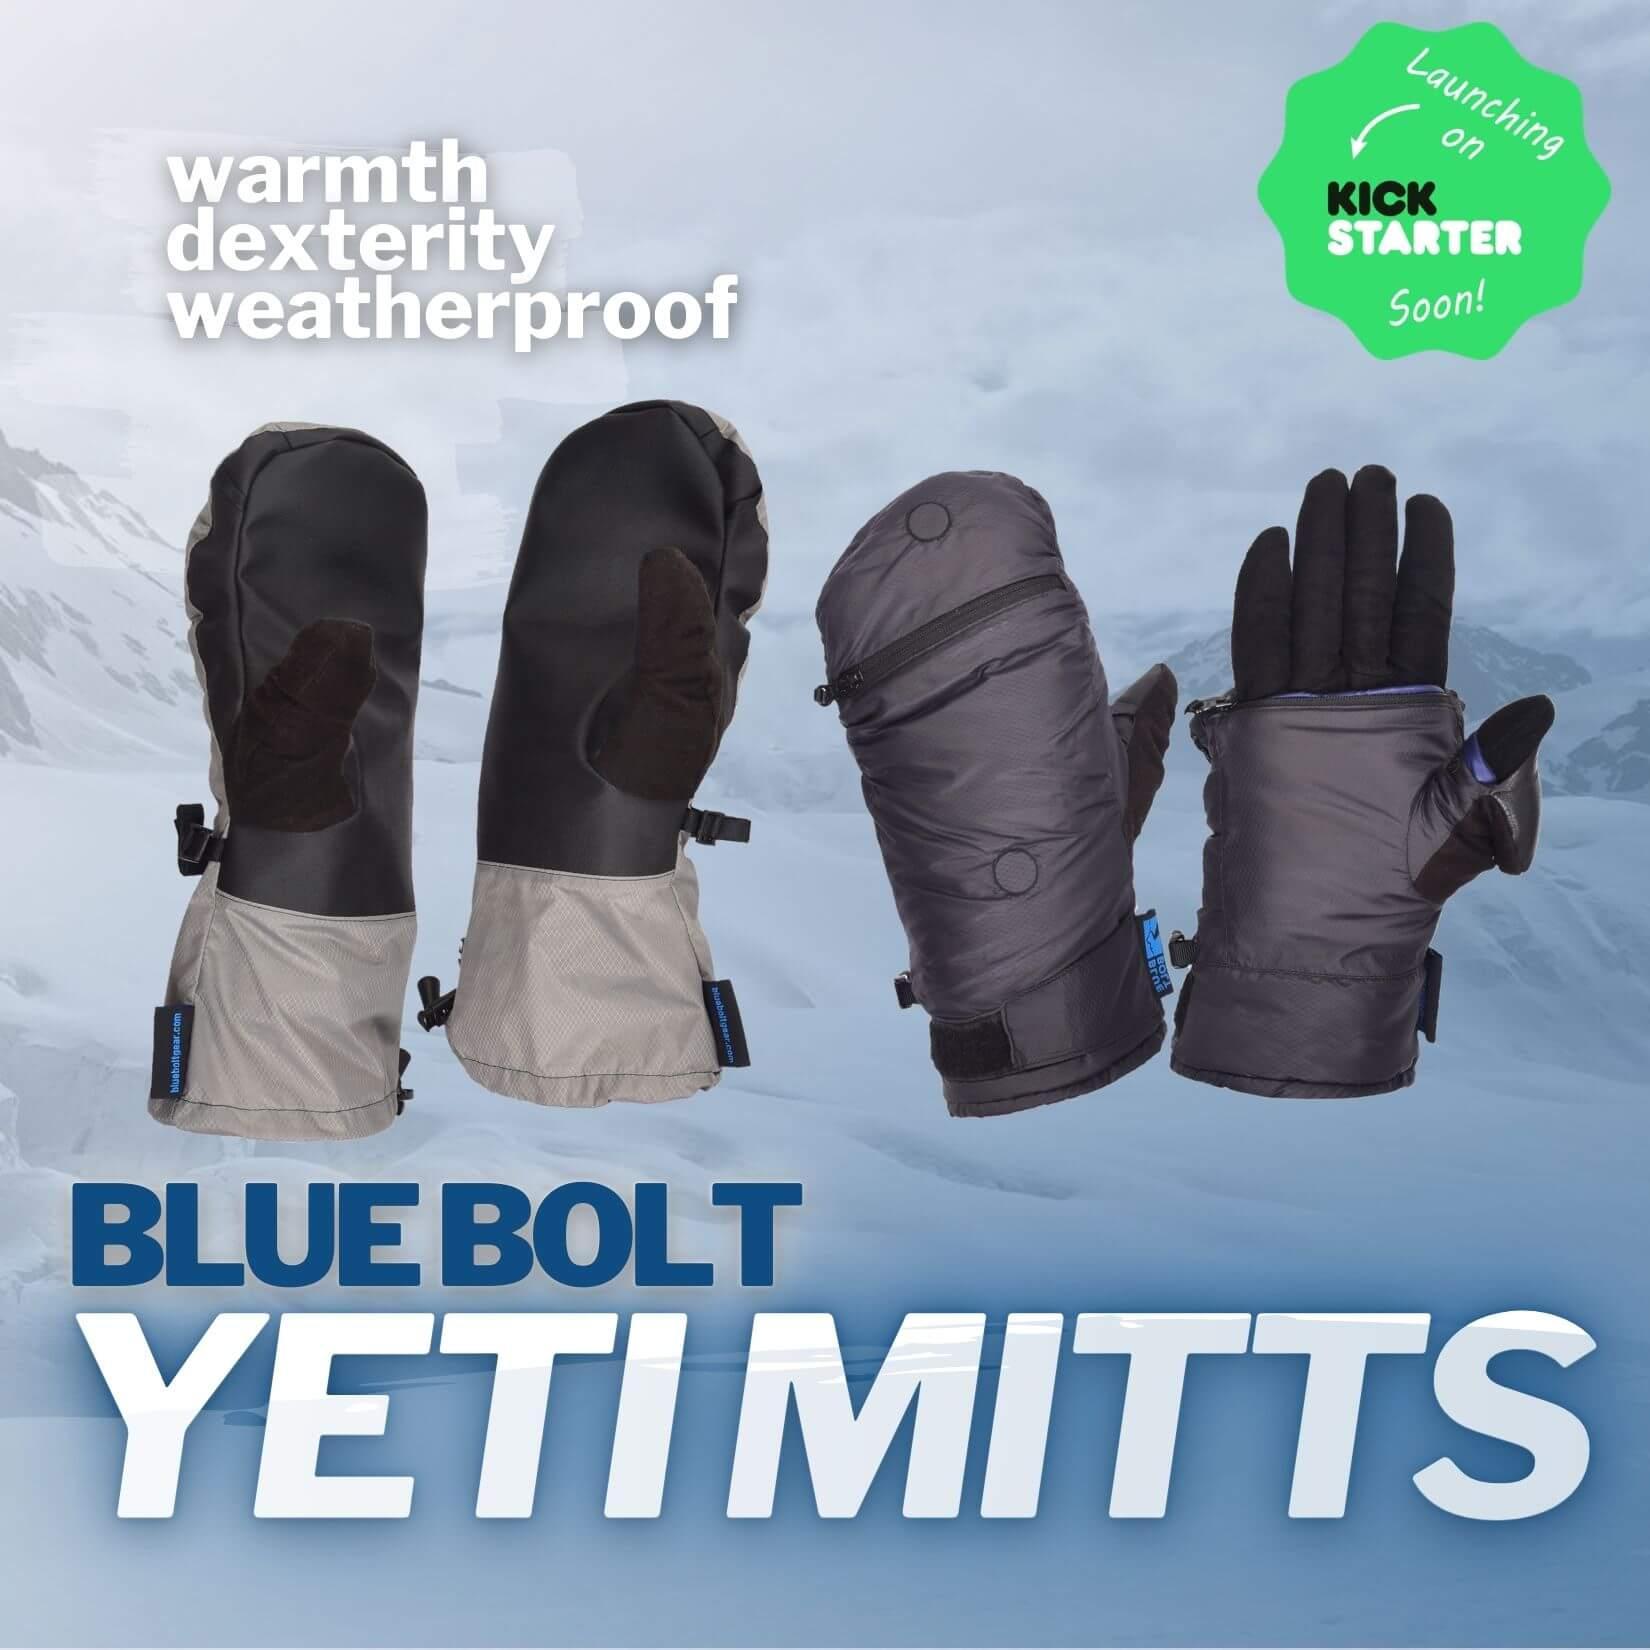 blue-bolt-yeti-mittens-benefits-infographic(1)